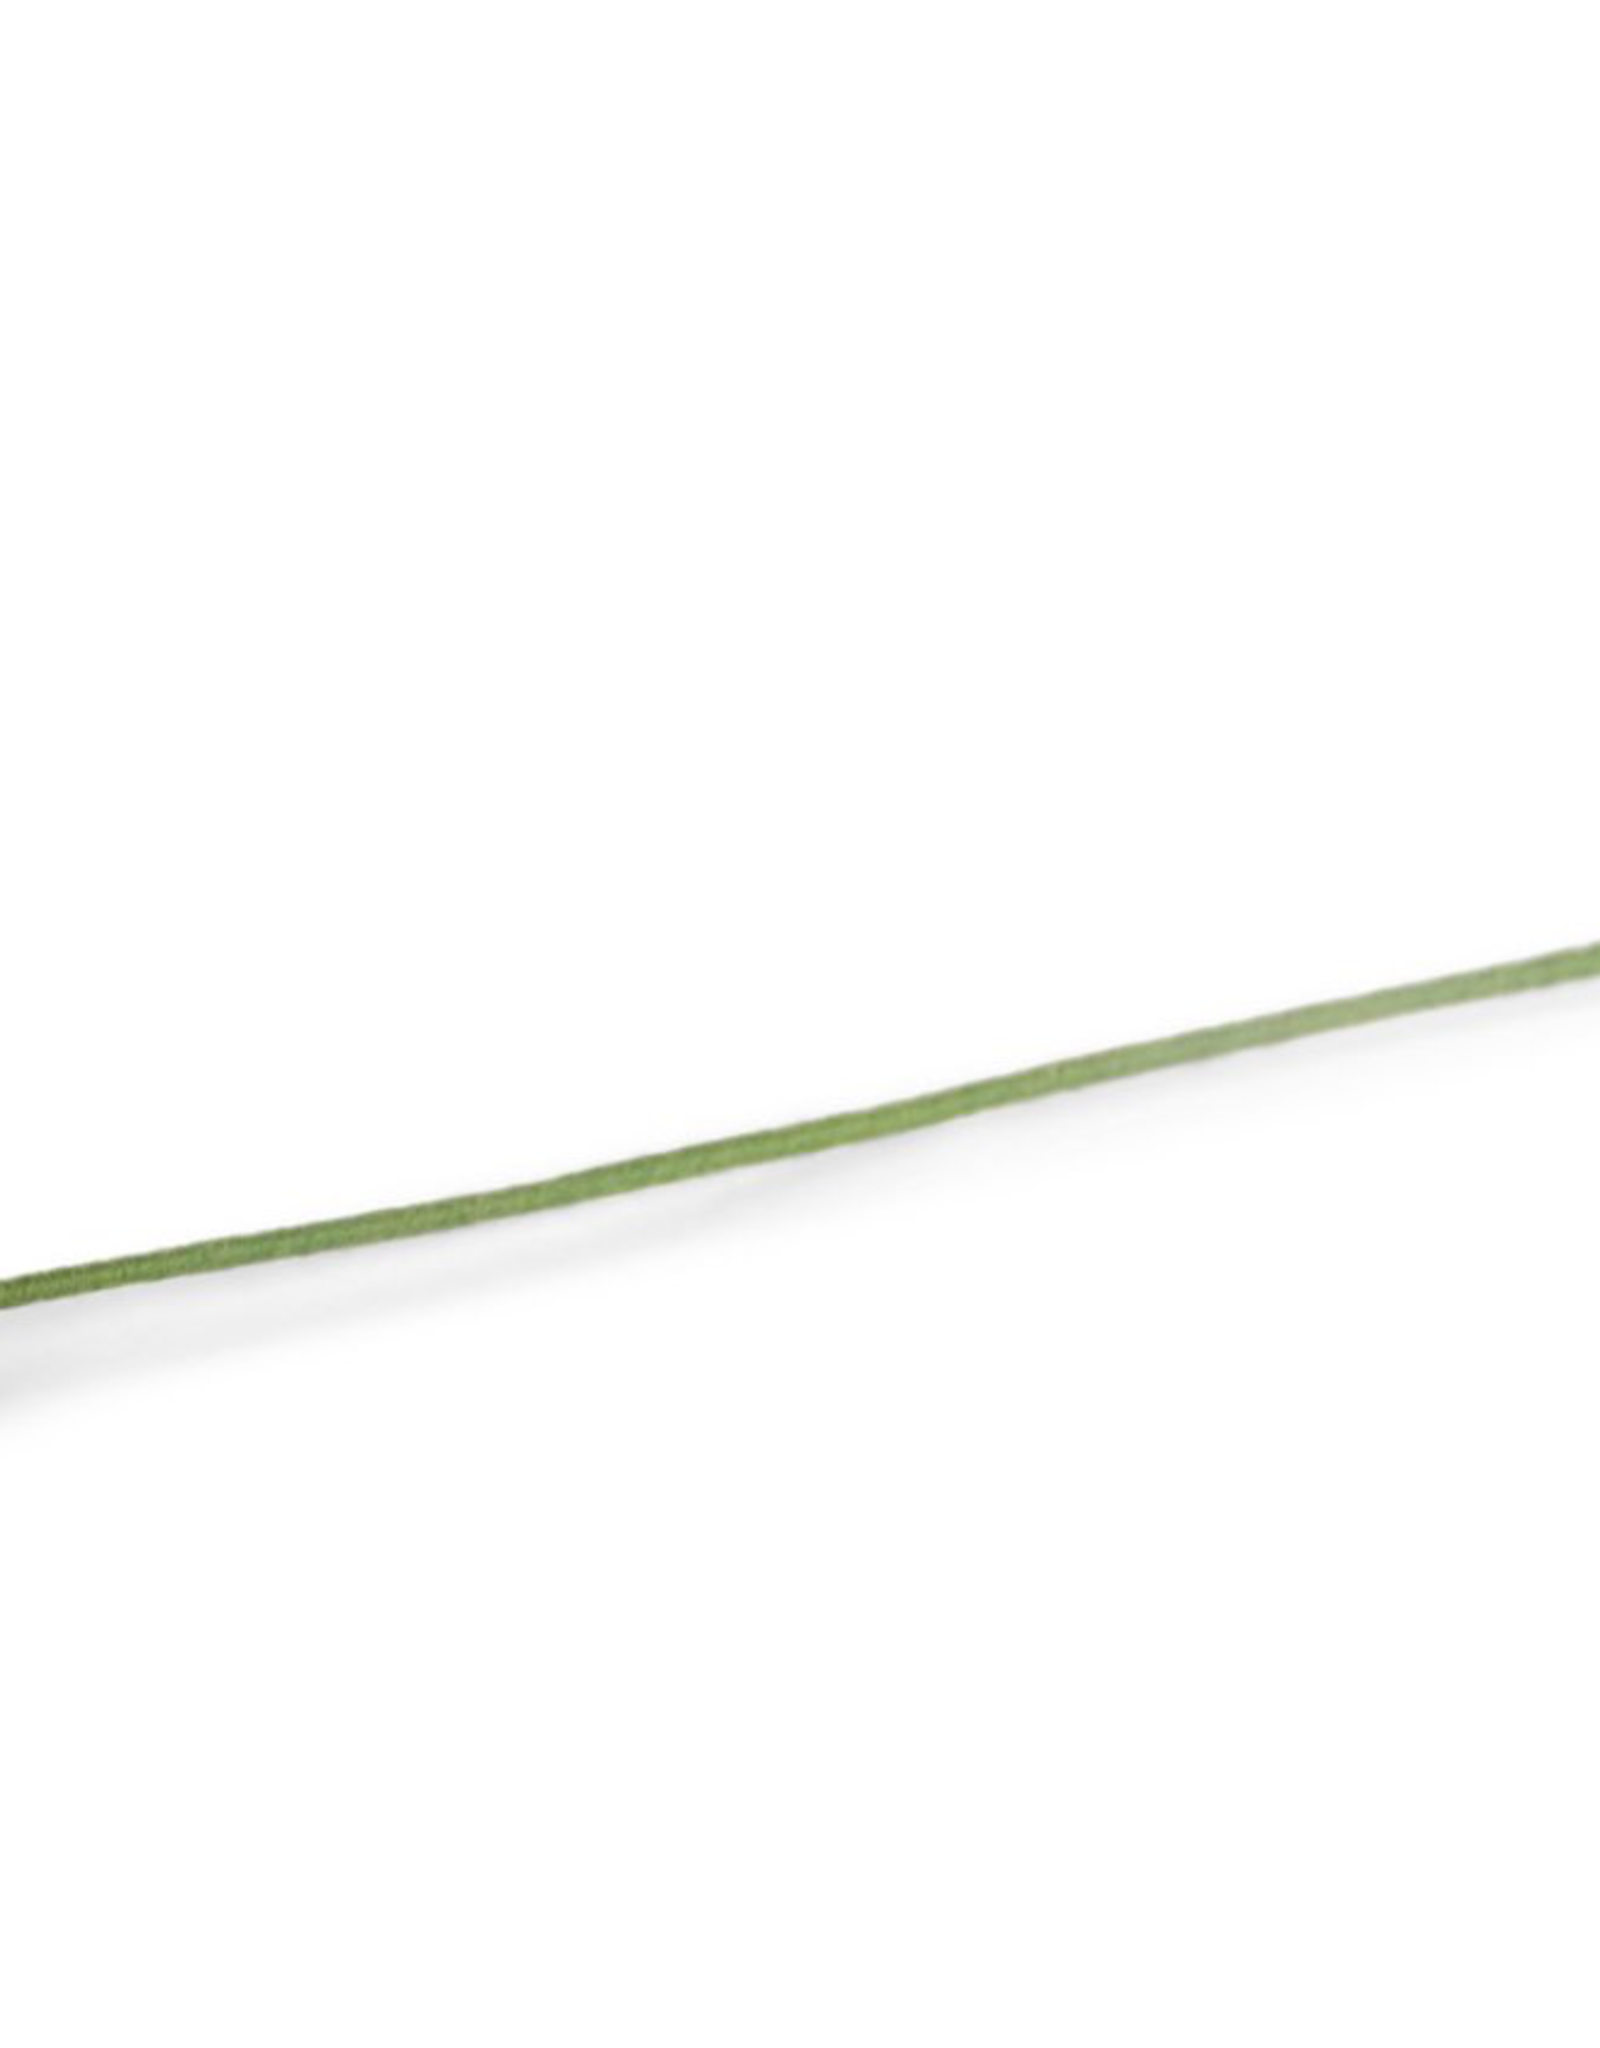 EGS EGS Flower-Cerise-Small